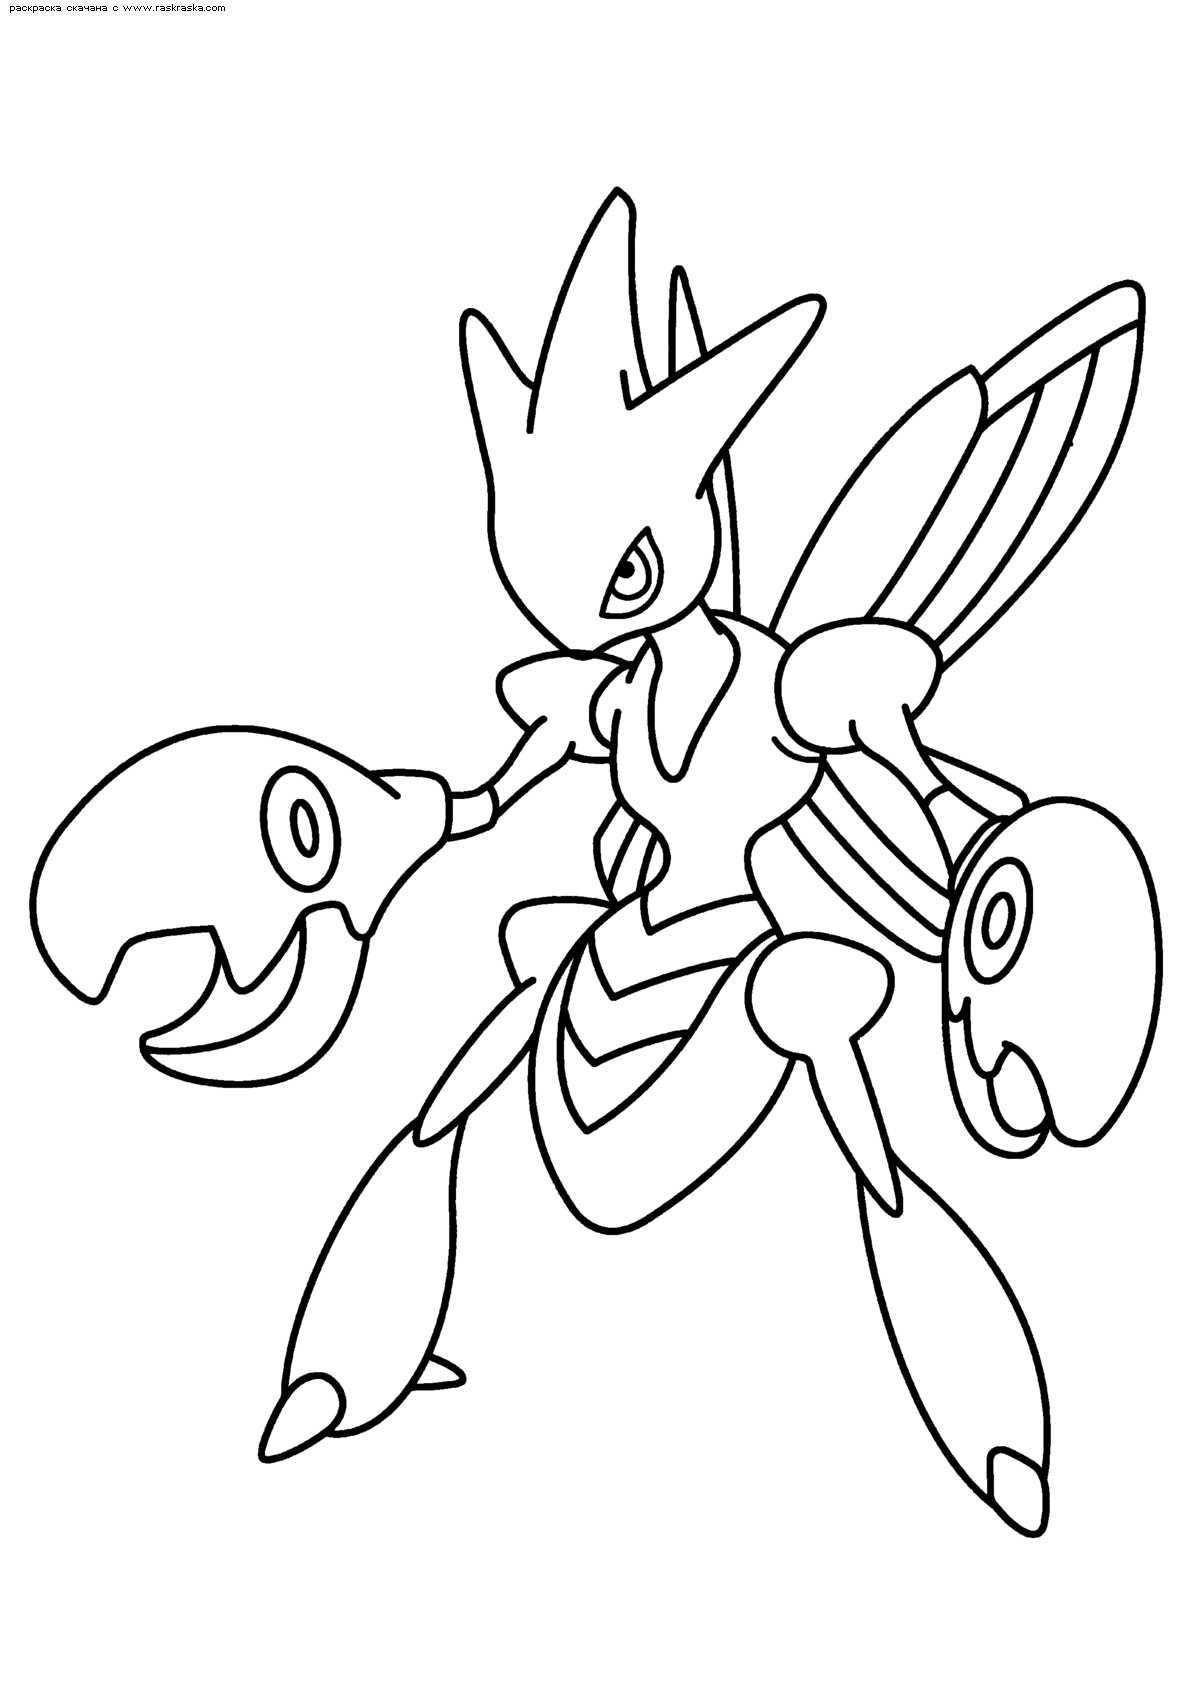 Раскраска Покемон Сизор (Scizor) | Раскраски эволюция ...